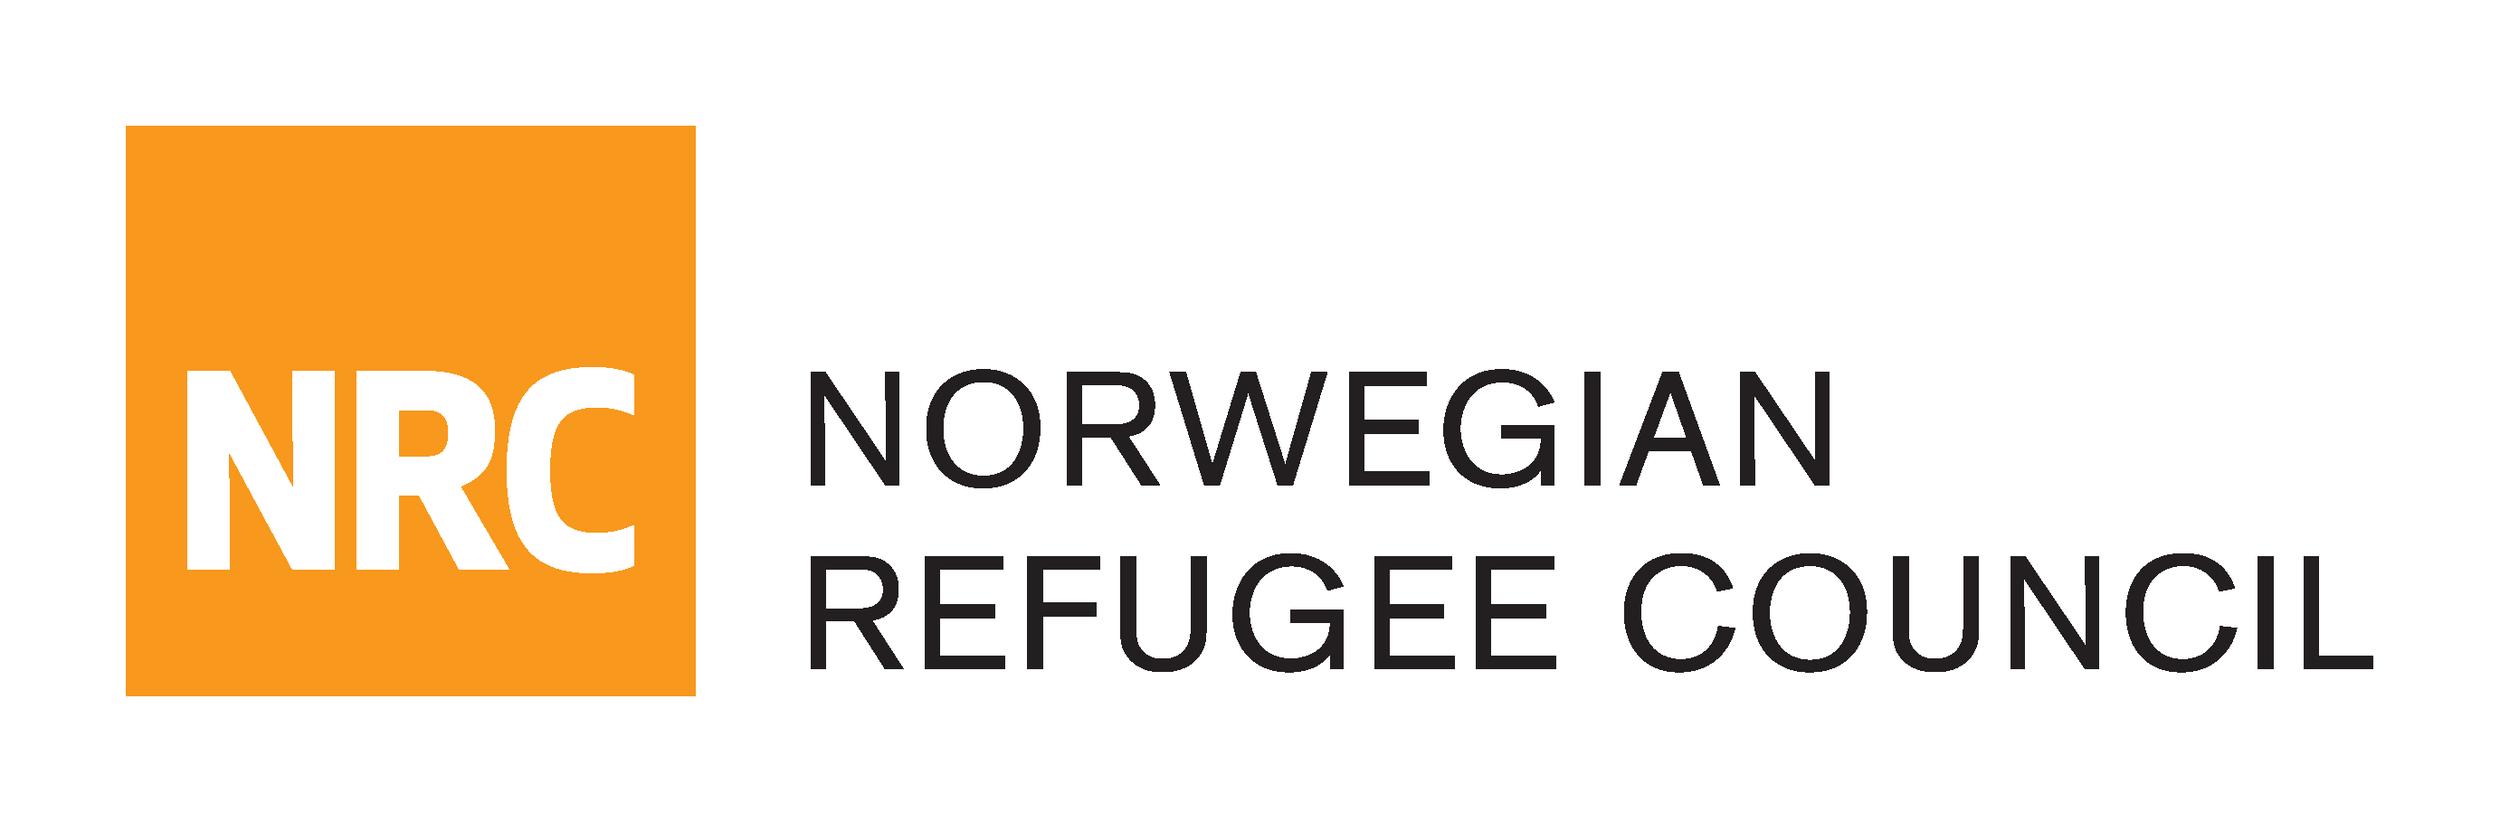 NRC_ENG_logo_horizontal_PMS144_pos_LEFT.PNG